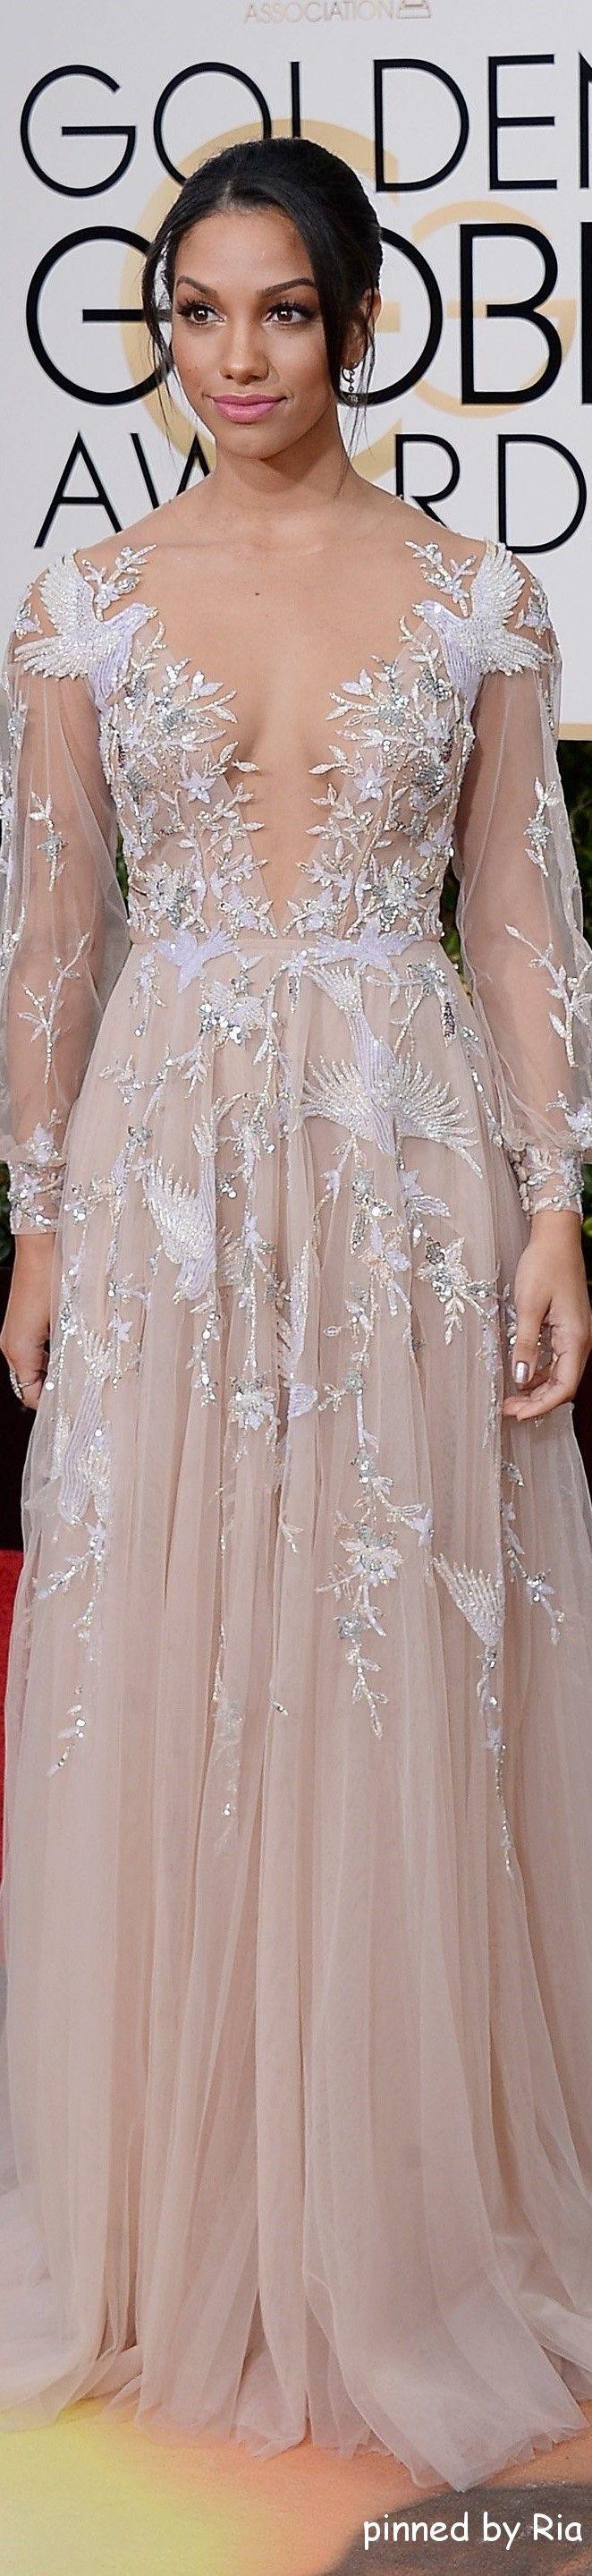 Corinna Foxx l Golden Globe Awards 2016 l Ria